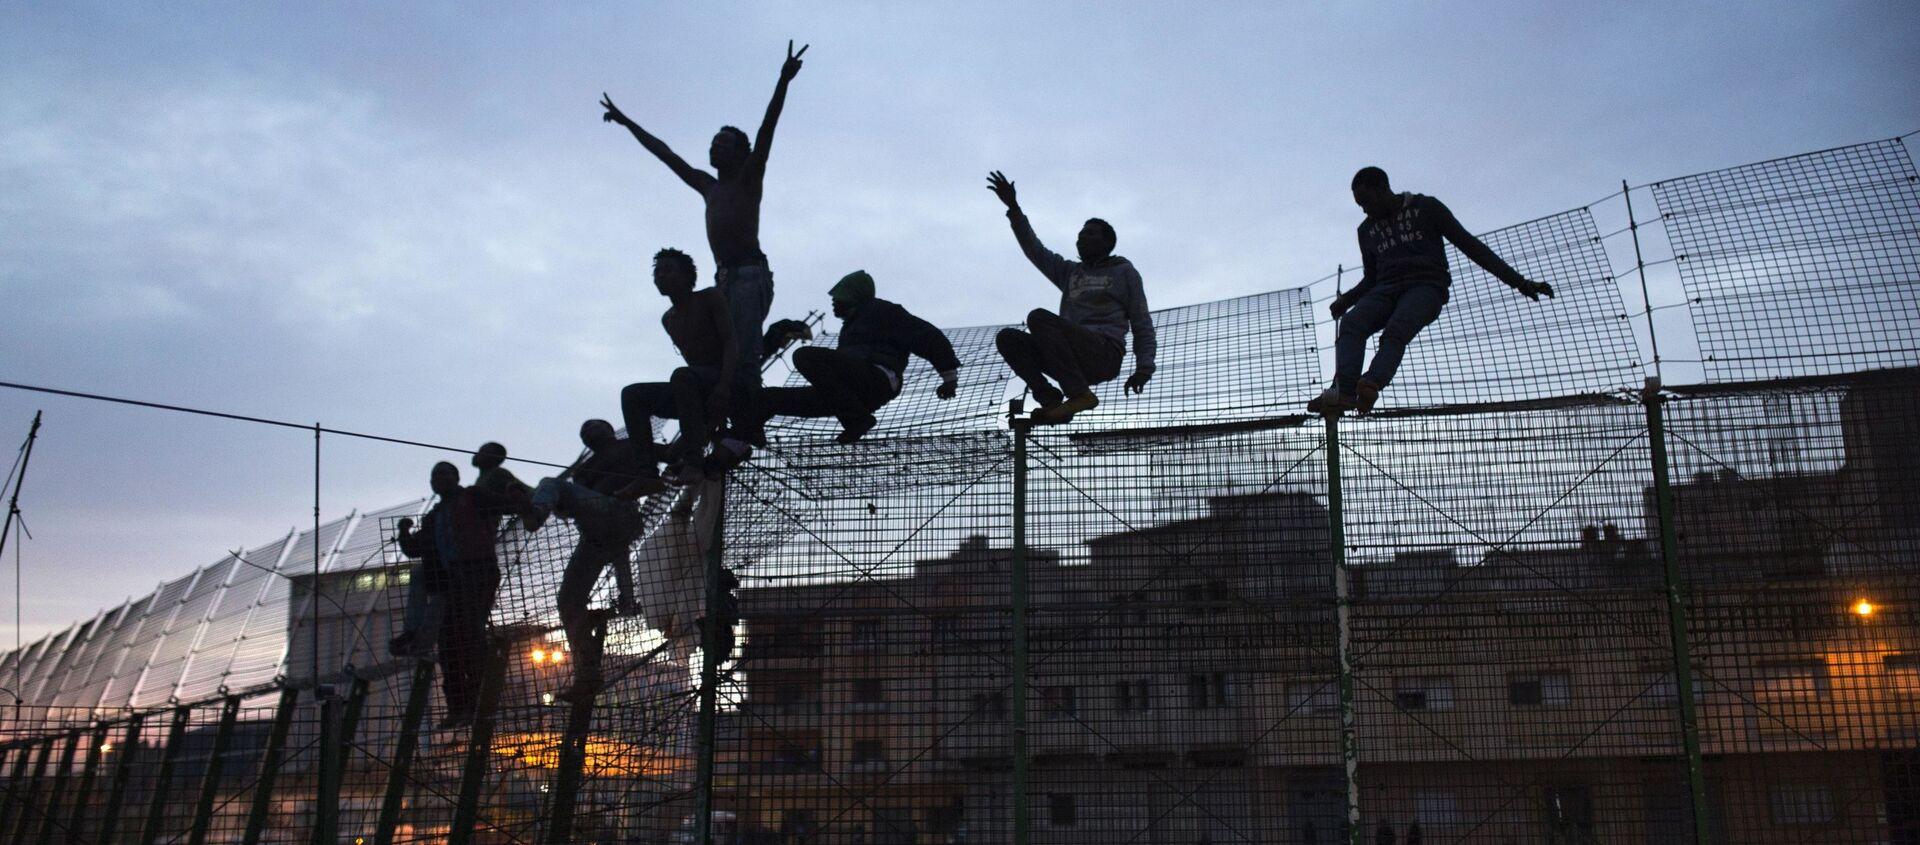 Inmigrantes subsaharianos trepan por la valla de Melilla - Sputnik Mundo, 1920, 28.02.2020